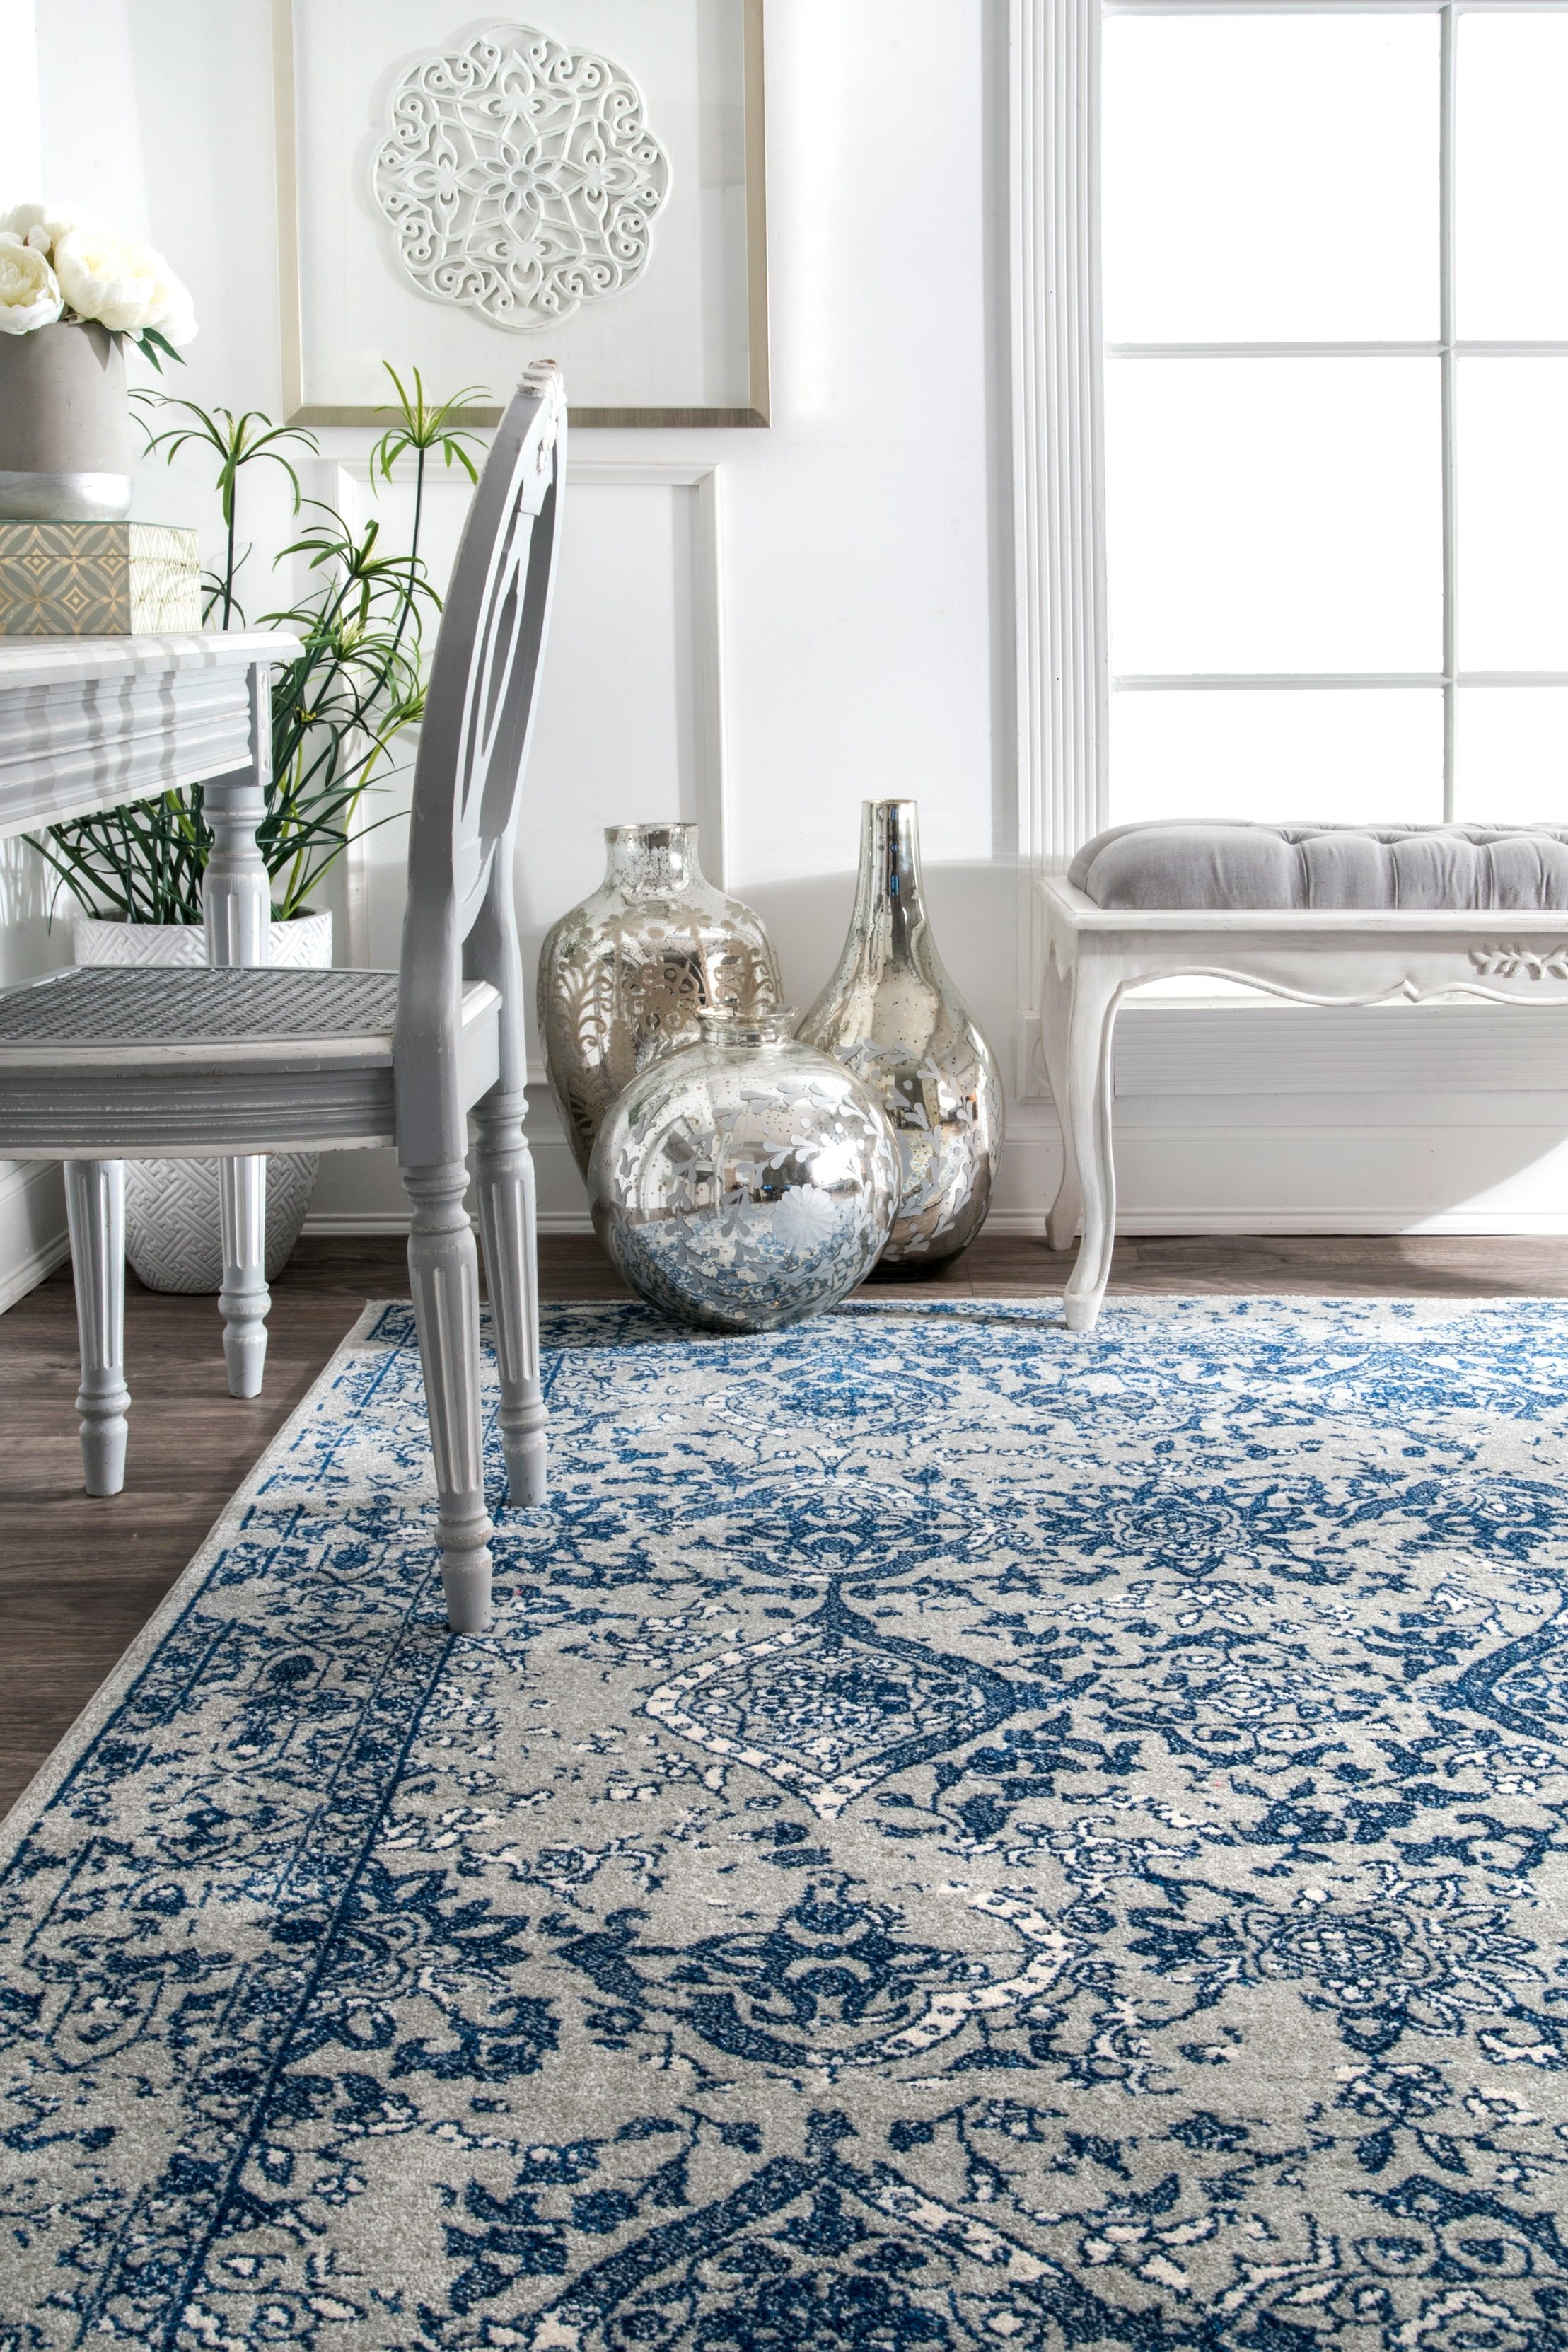 Bosphorus Floral Ornament Light Blue Rug Light Blue Rug Rugs Carpet Dining Room